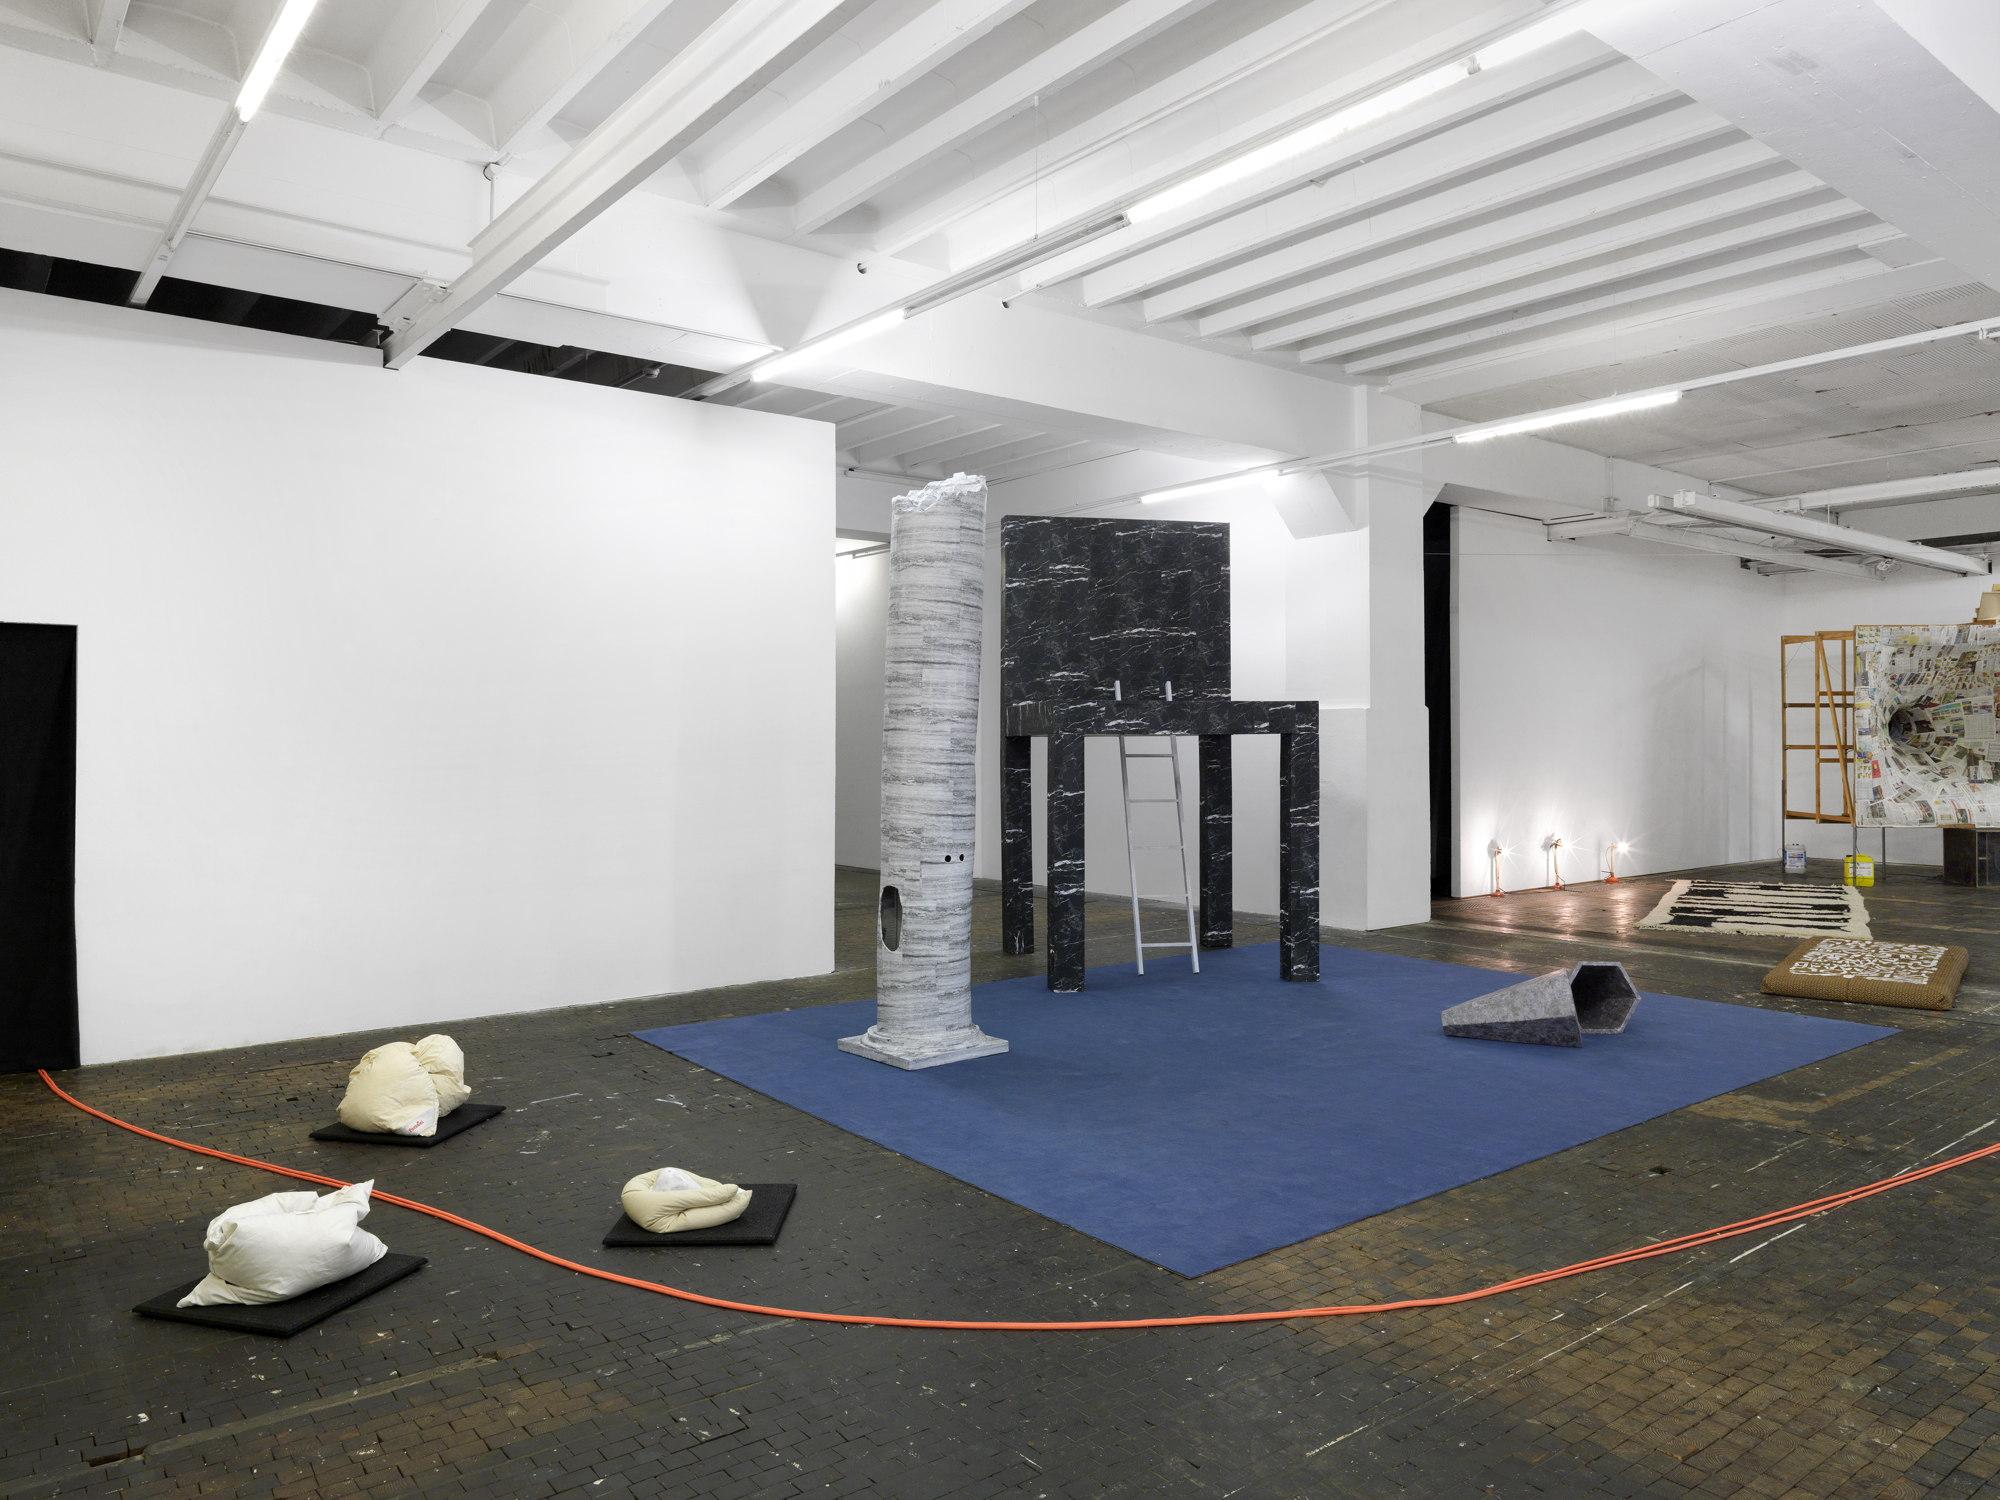 alpina huus at le commun b timent d art contemporain. Black Bedroom Furniture Sets. Home Design Ideas